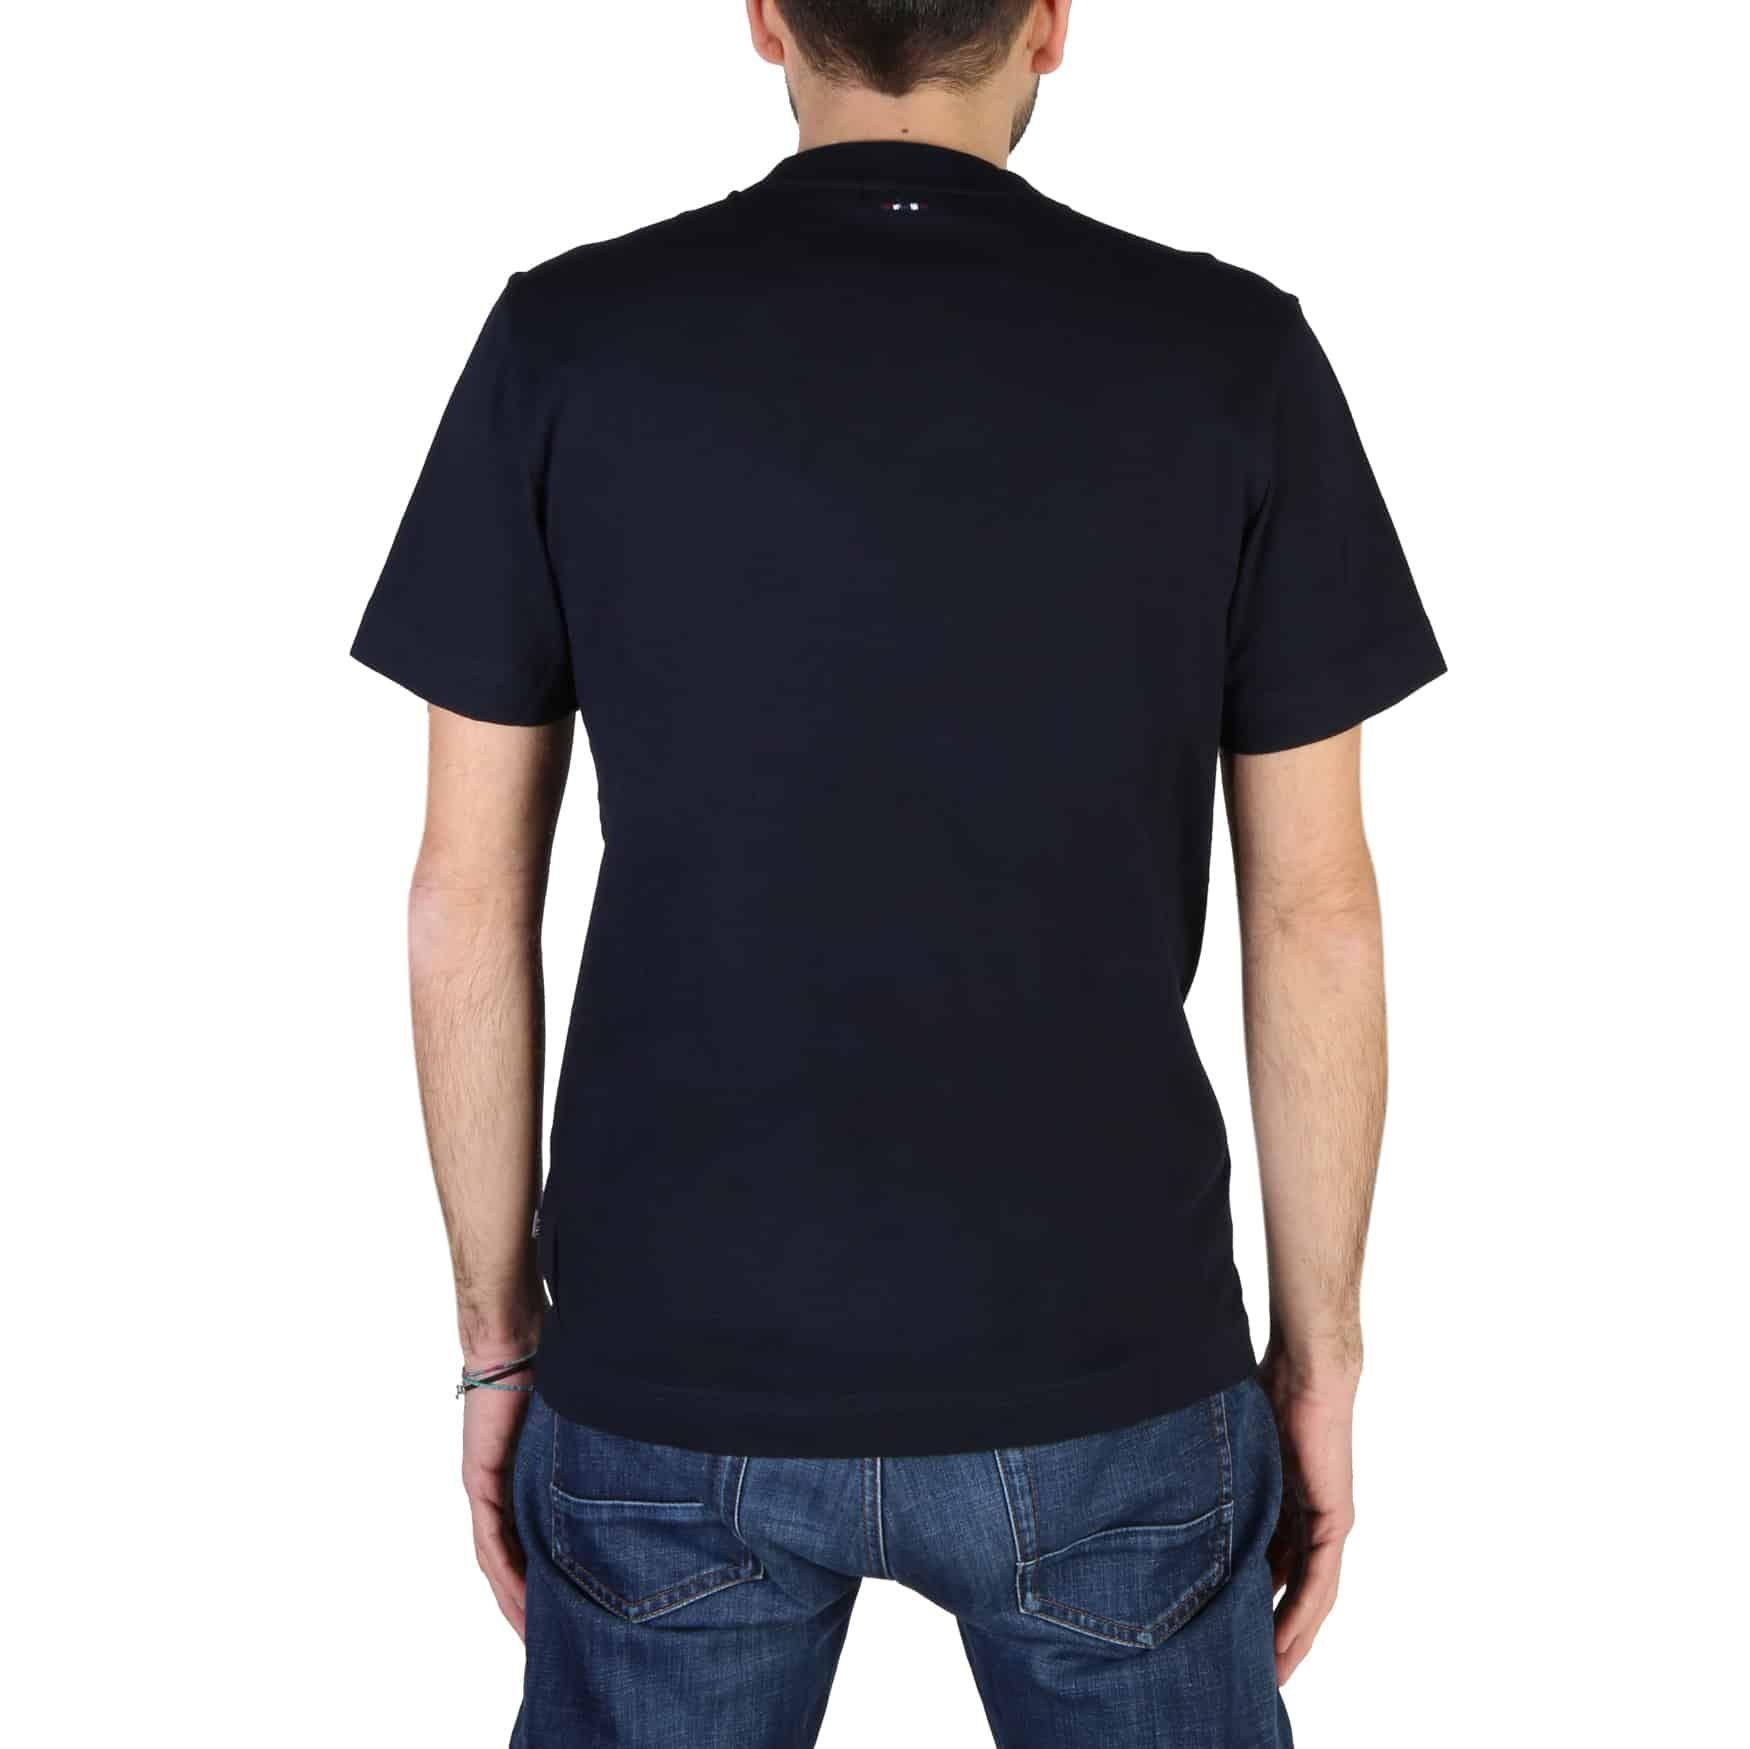 T-shirts Napapijri – SOLANOS_NP0A4E39